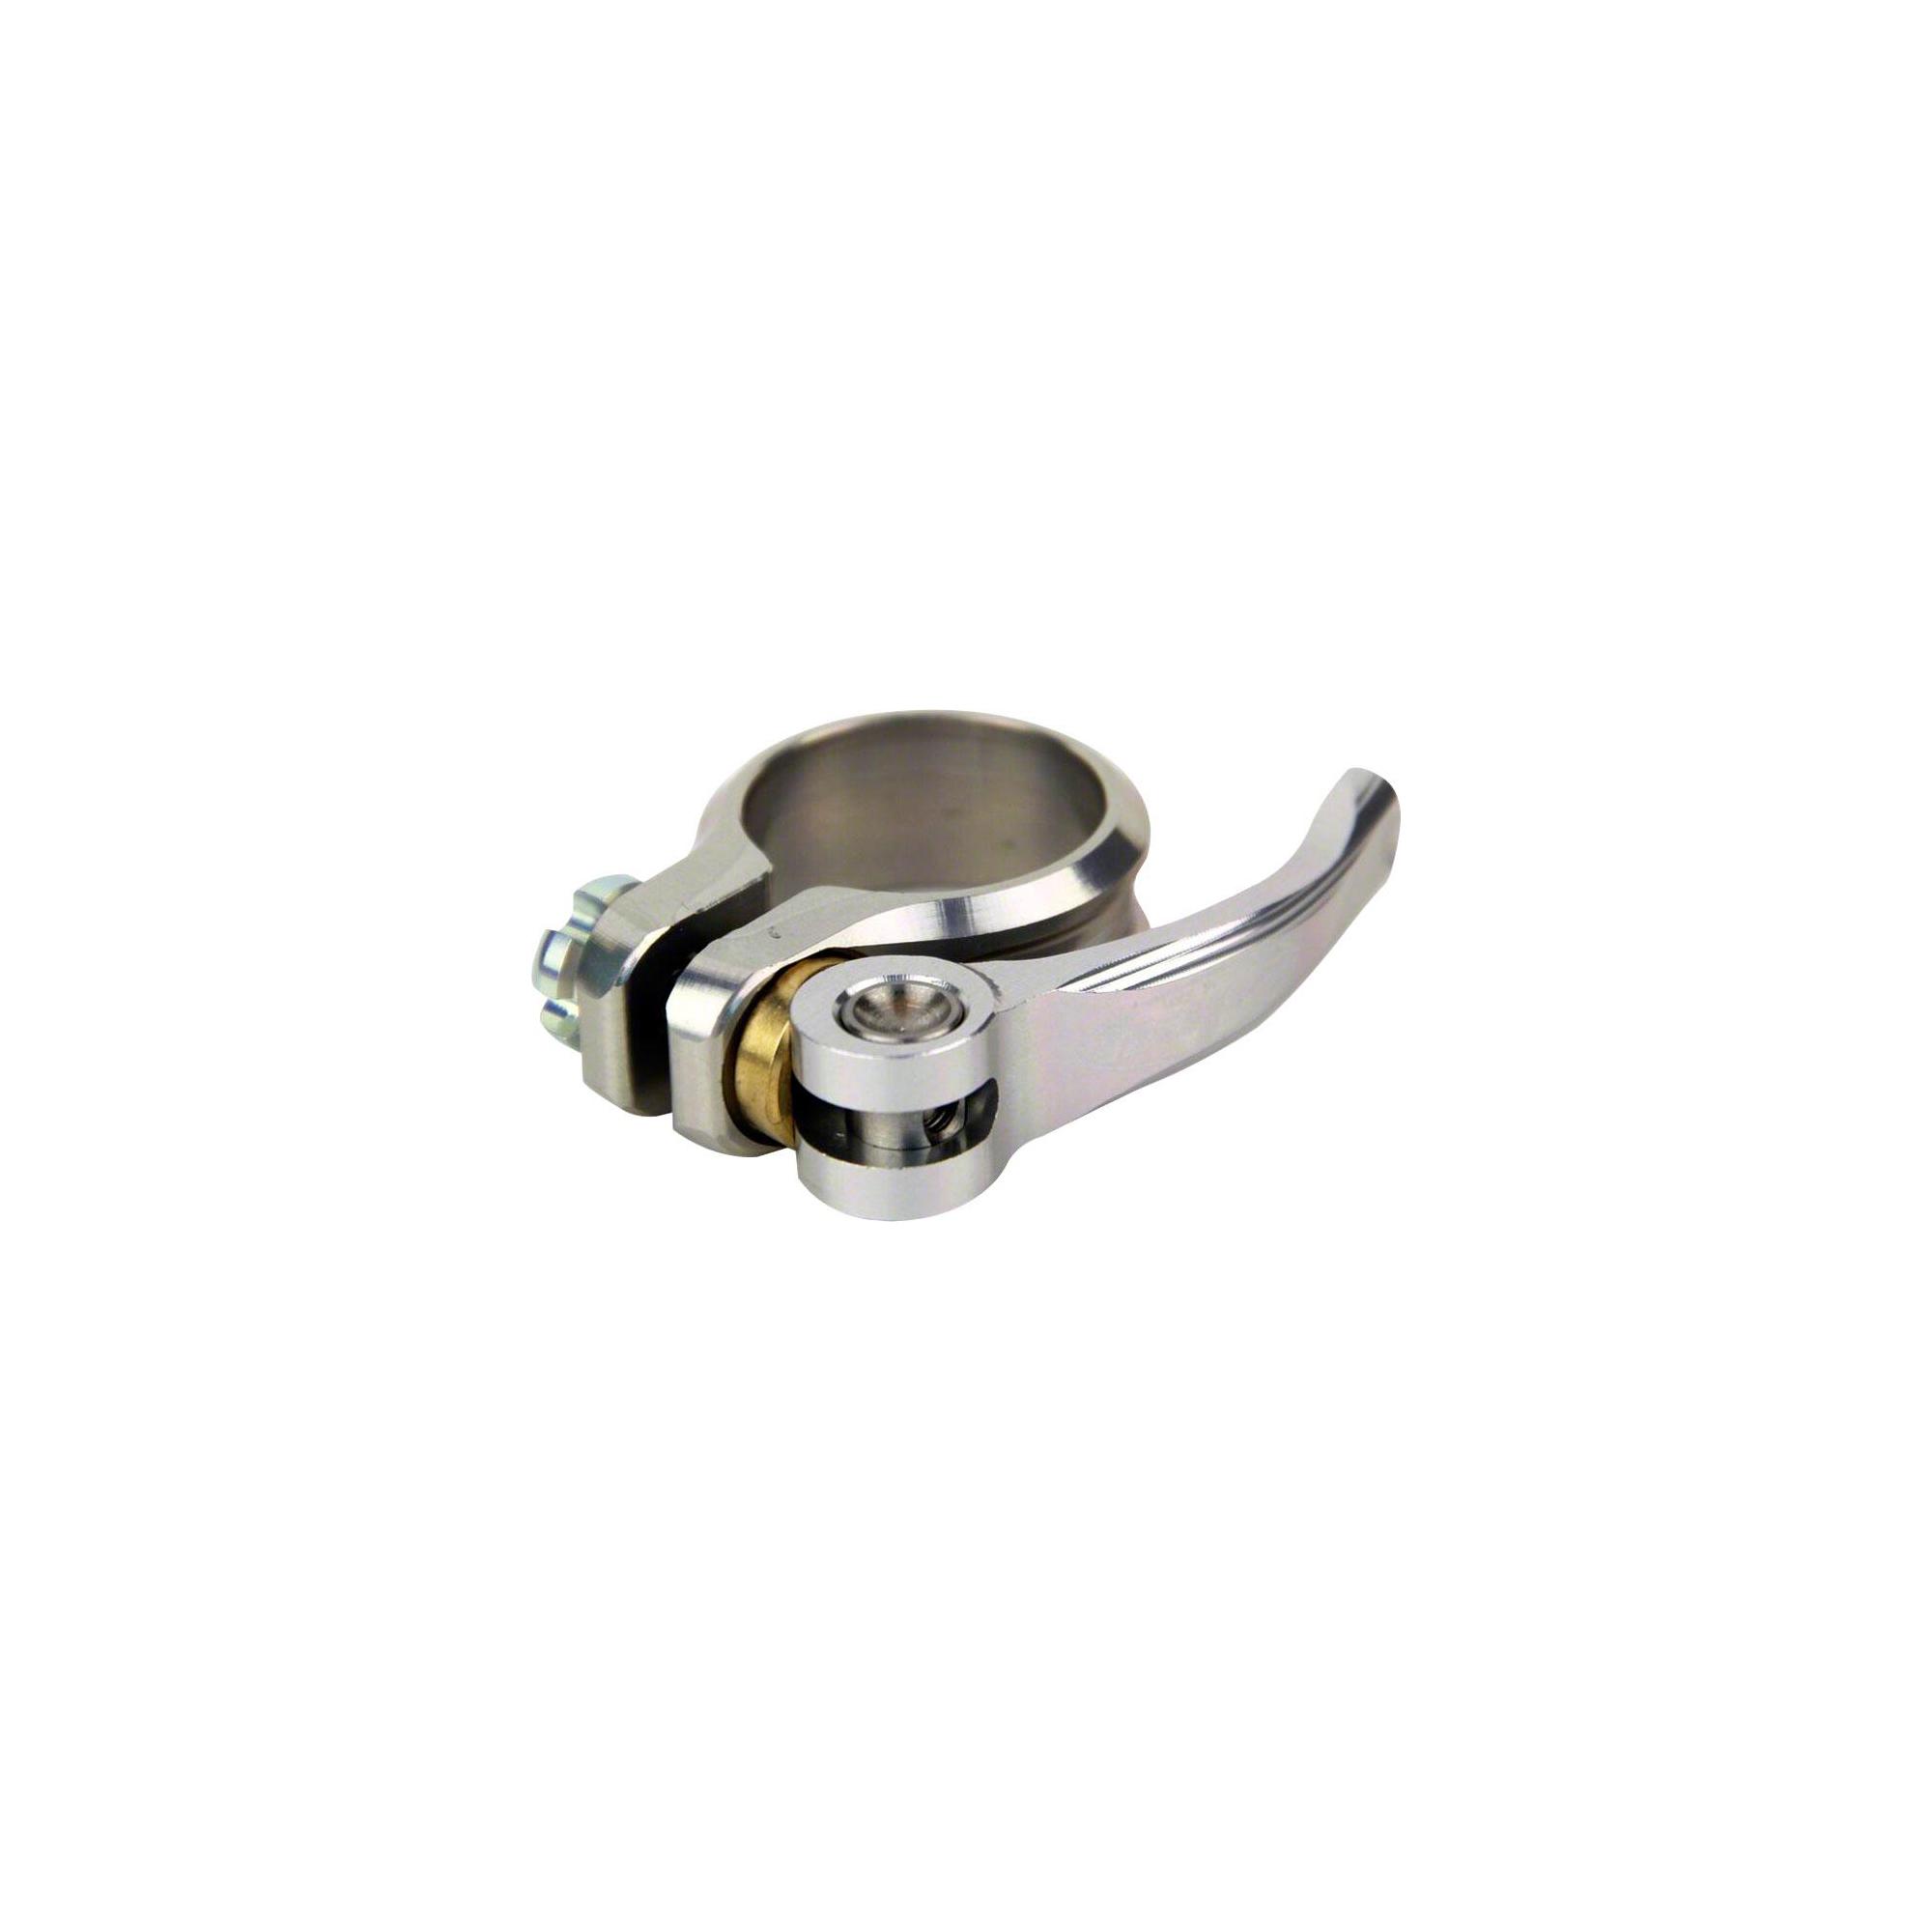 H67 34.9mm Silver gobike88 KREX Alloy QR Seatpost Clamp 42g